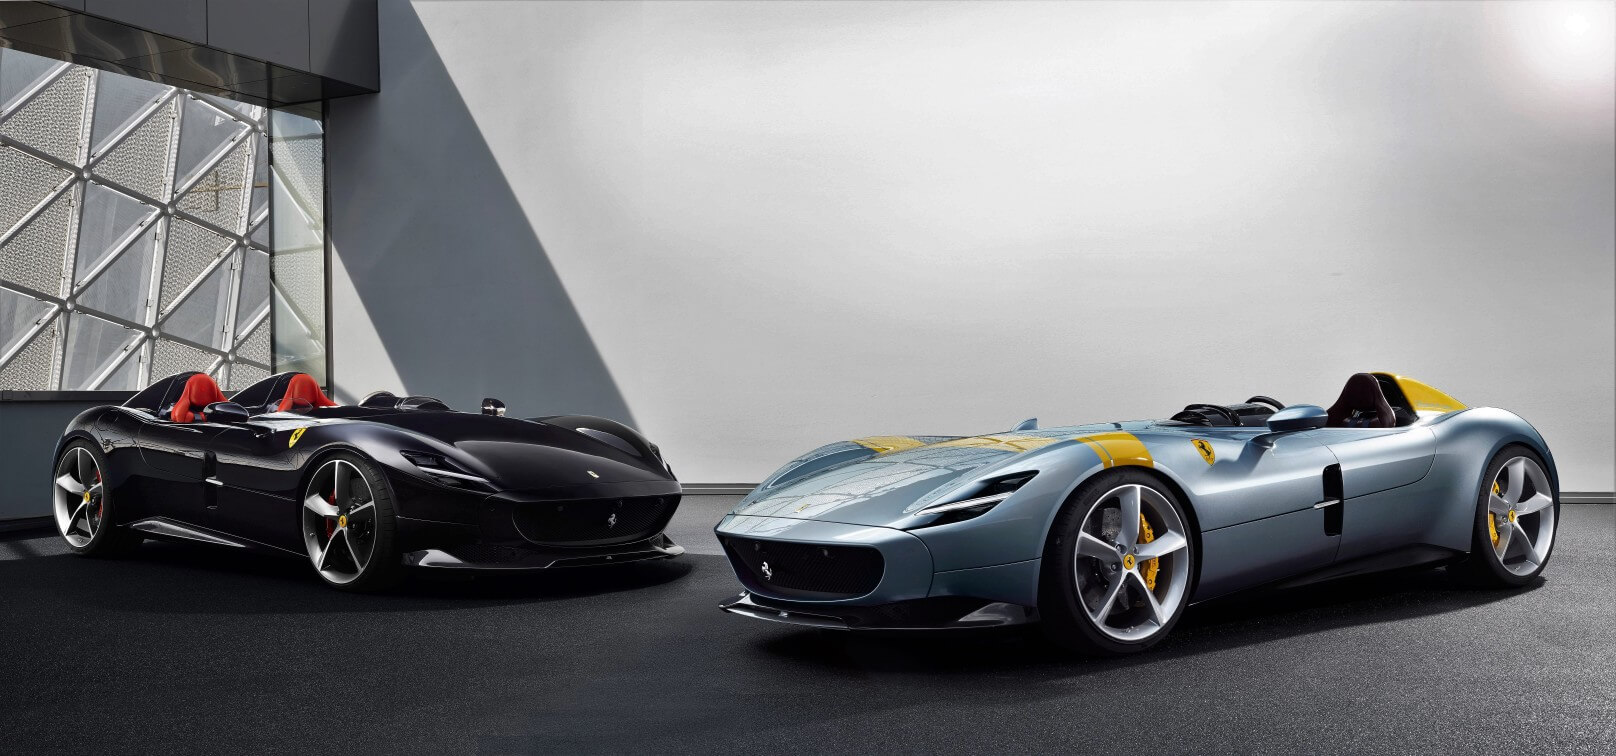 Ferrari Monza SP1 deportivo sin parabrisas